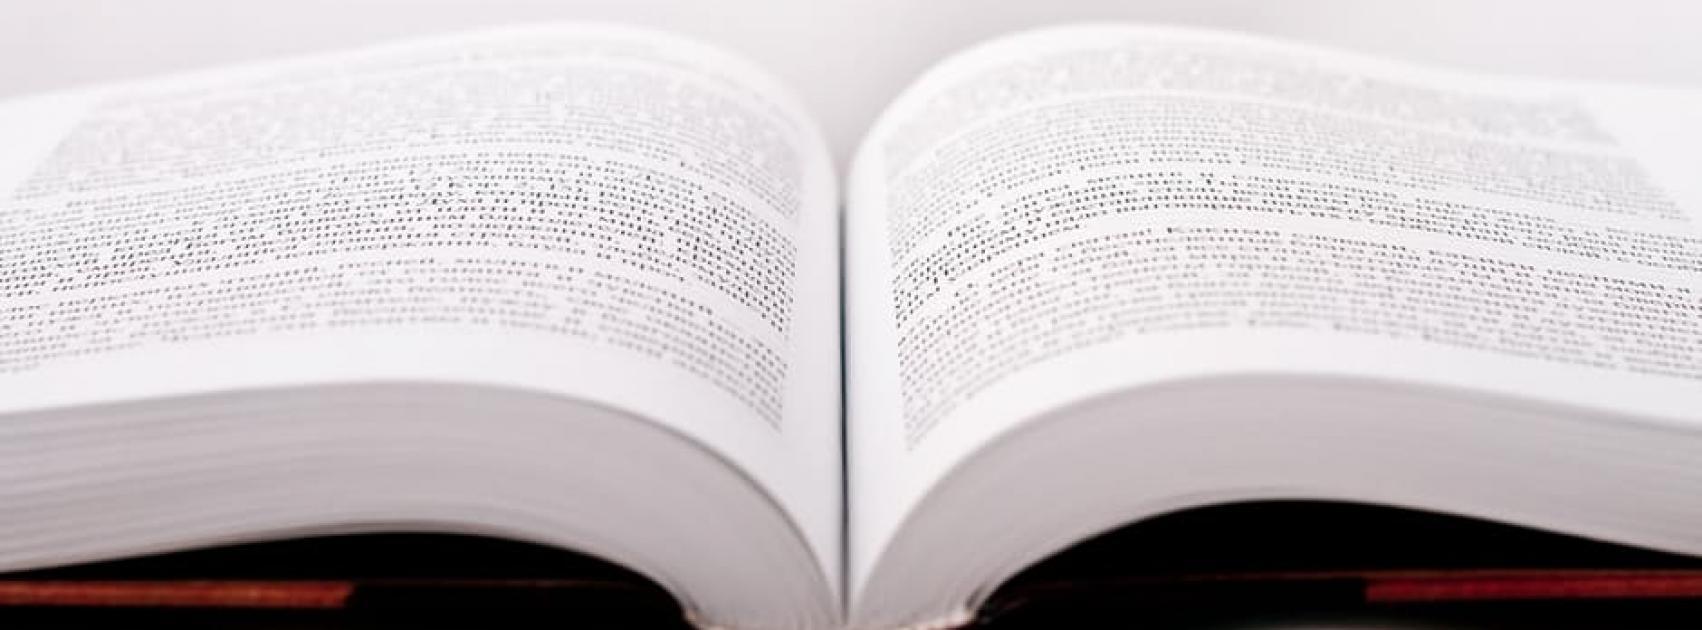 book-reading-library-literature-159697.jpeg